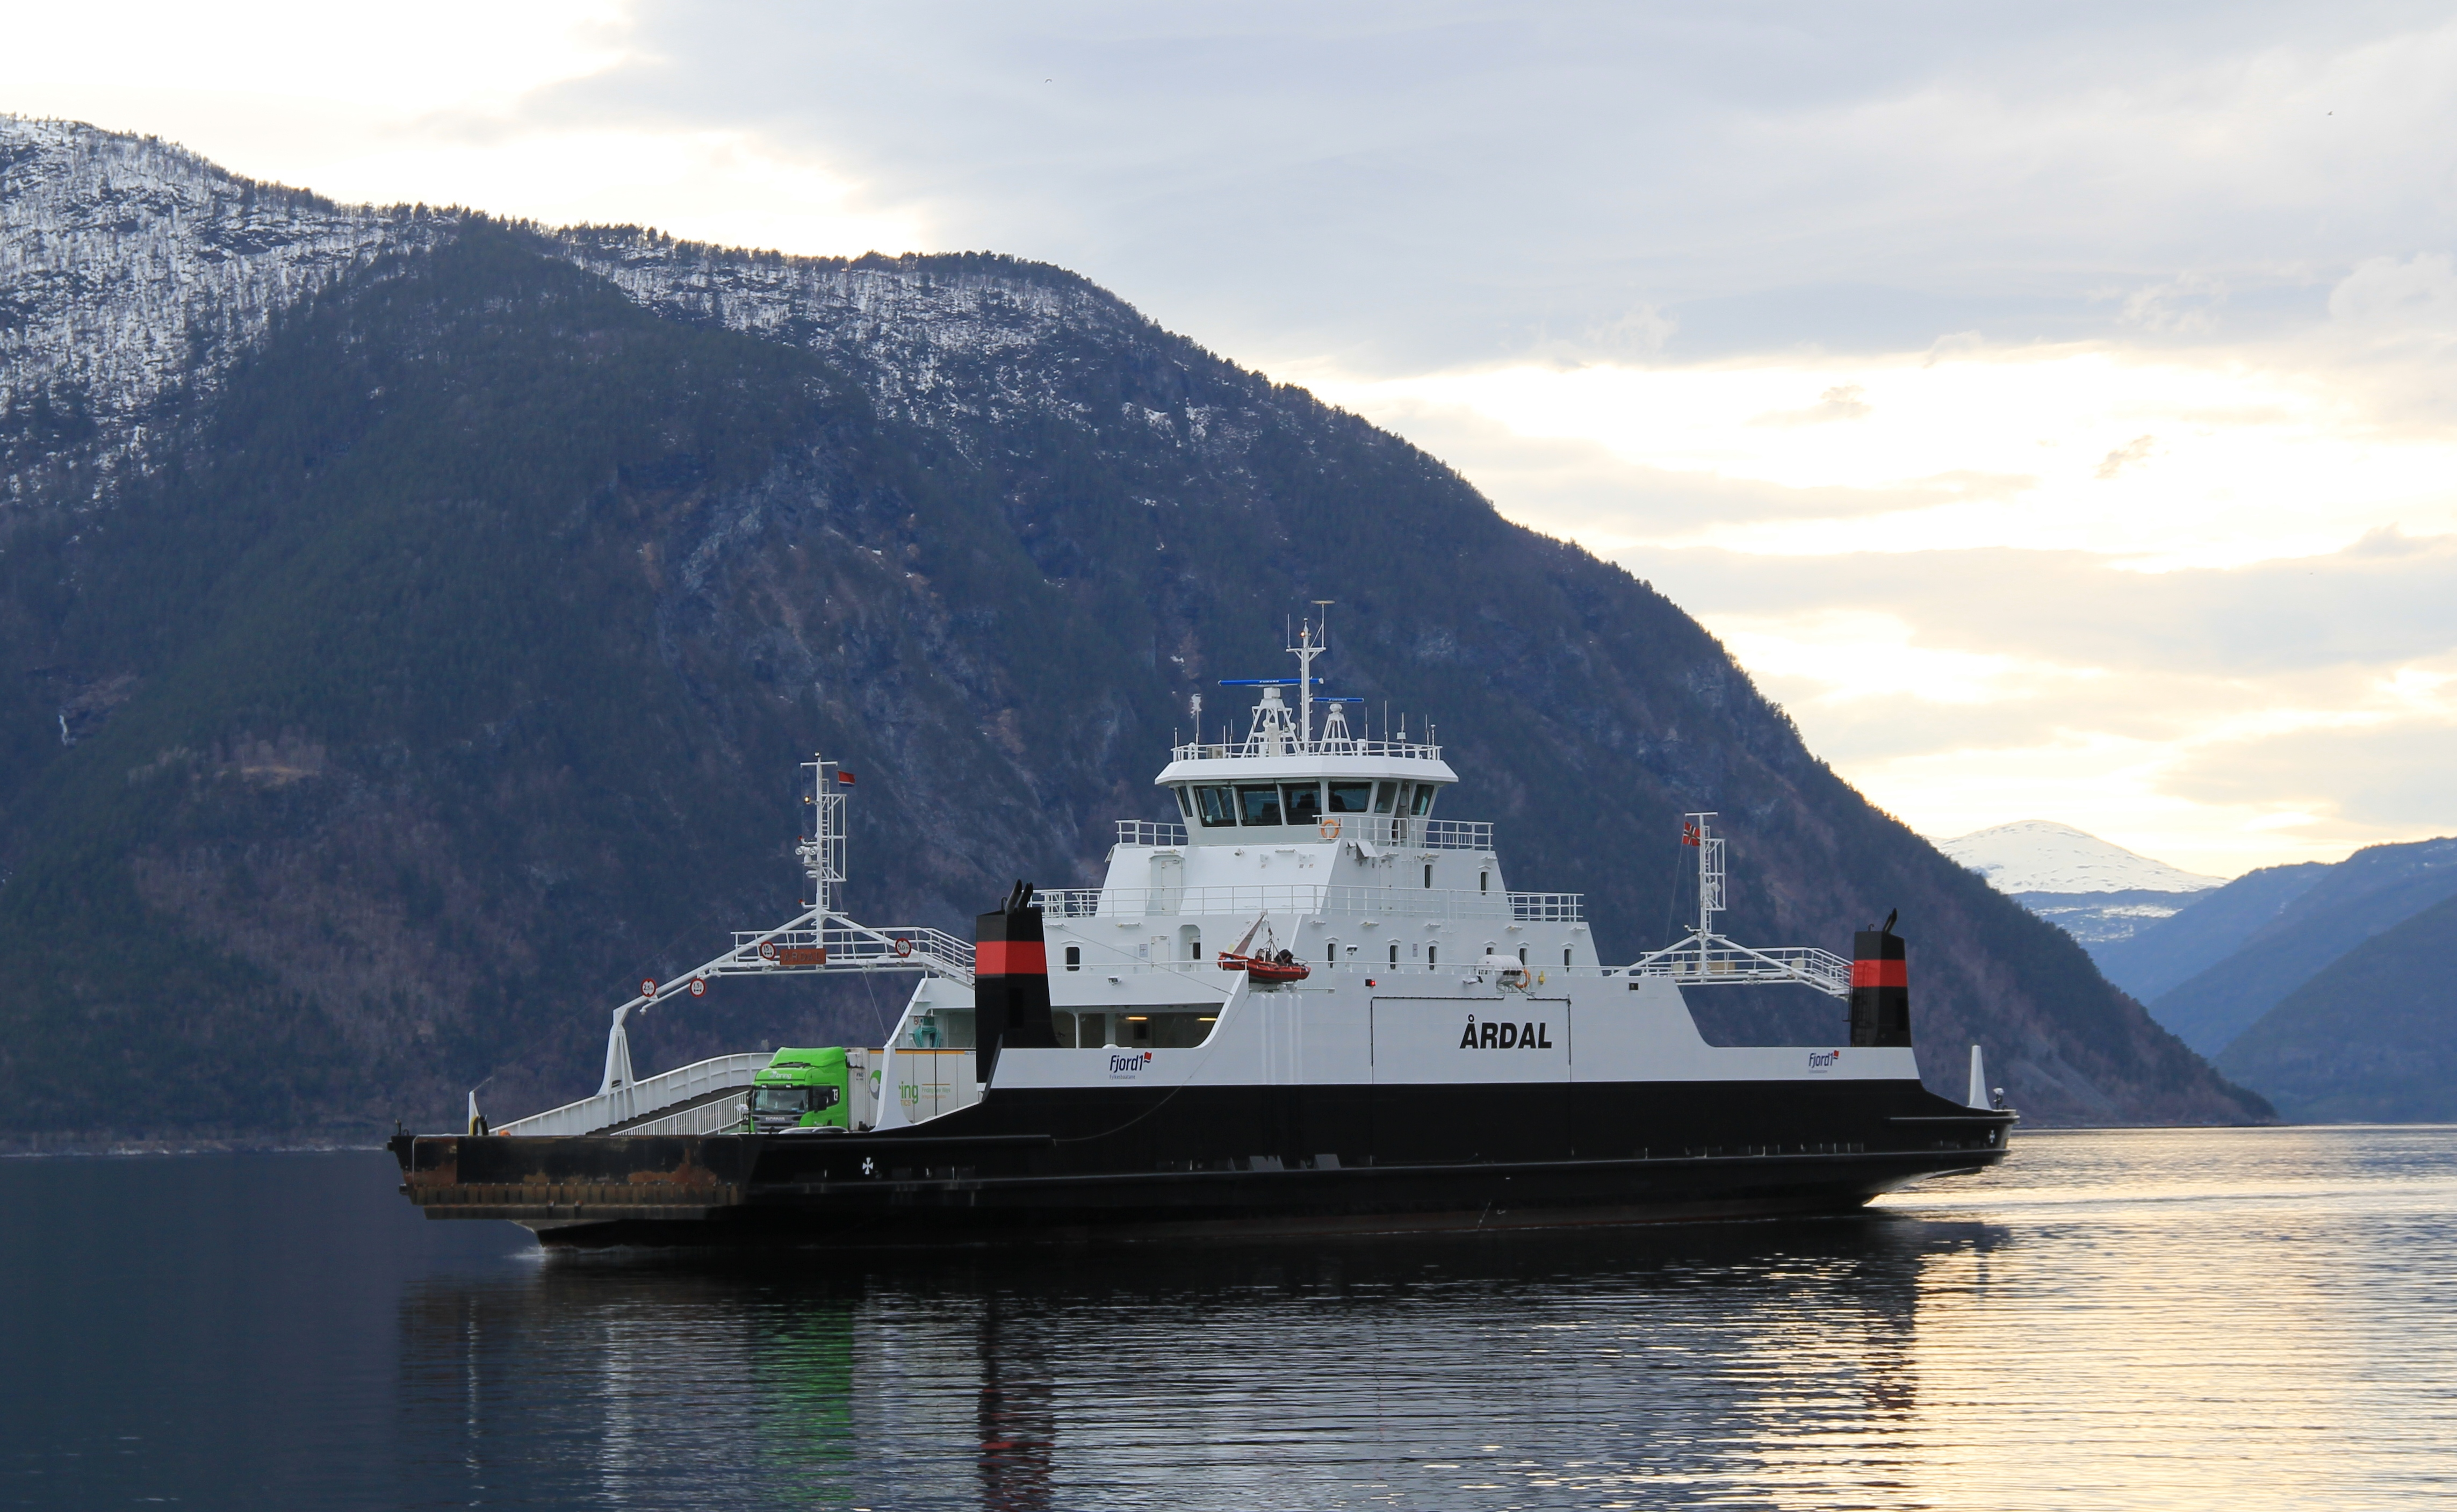 Cruising The Coast In A Small Ship  Norway Forum  TripAdvisor